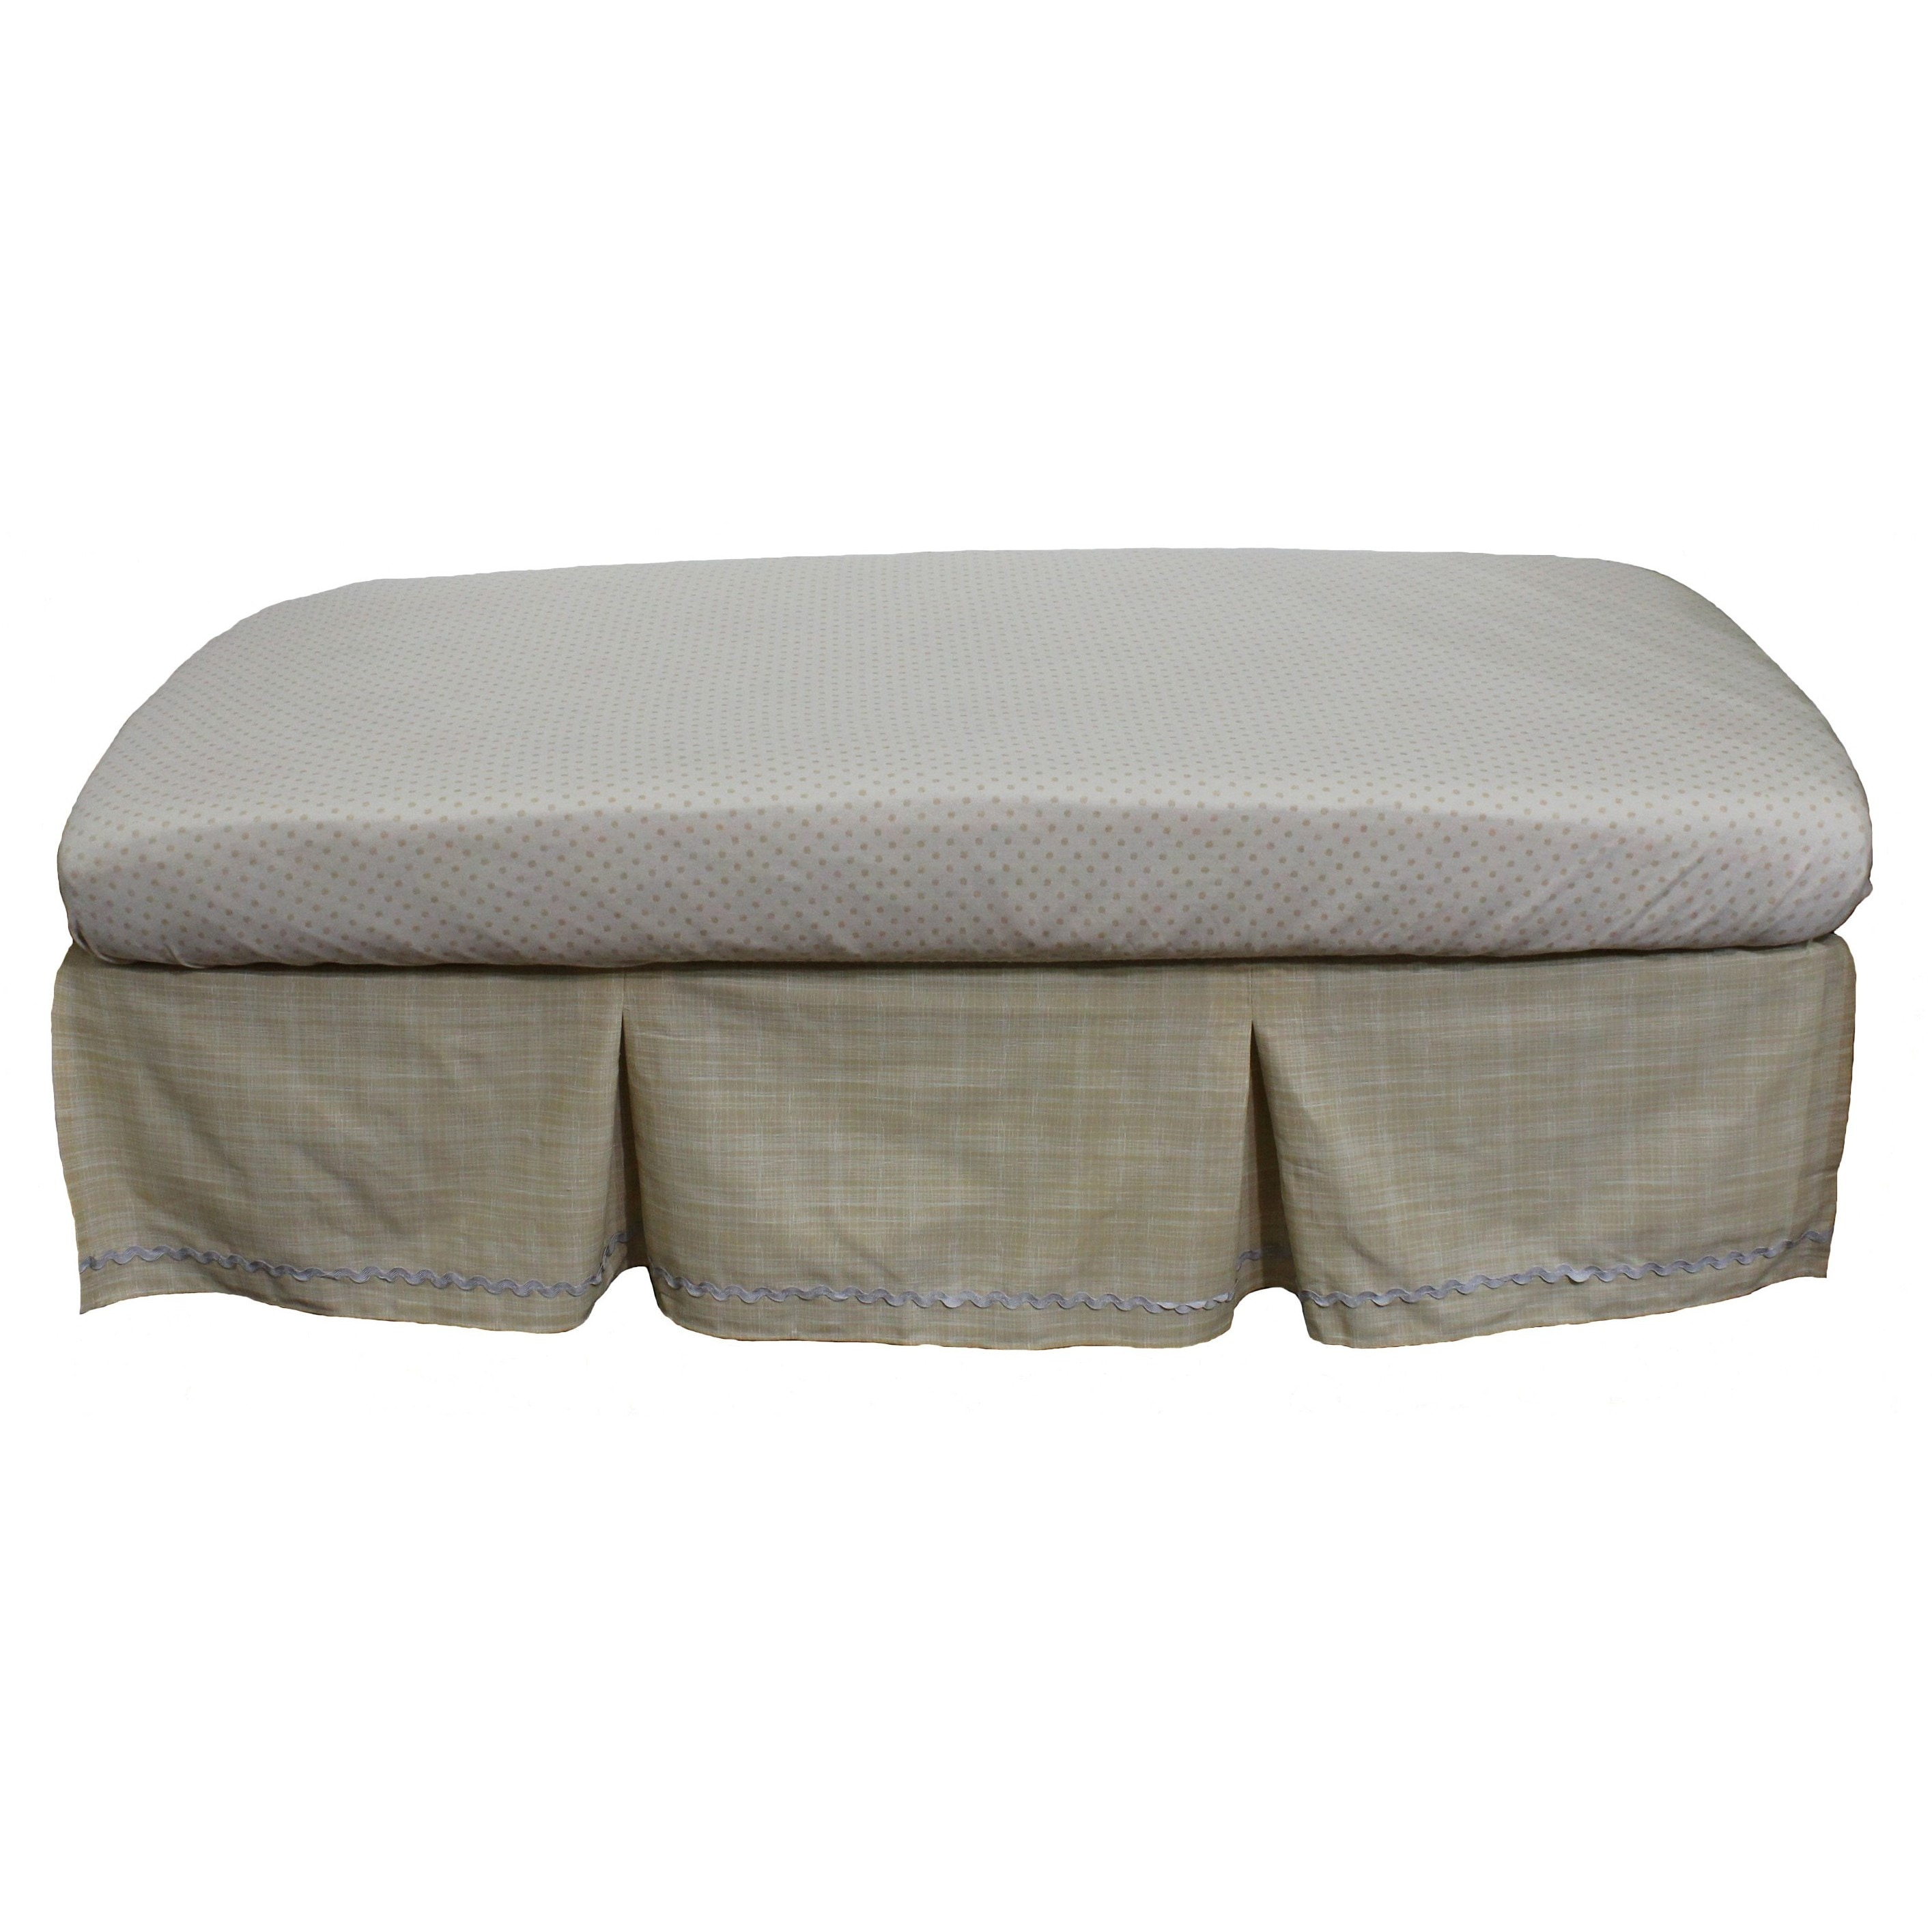 Nurture Basix Tan Twill Organic 2-piece Bedding Starter S...